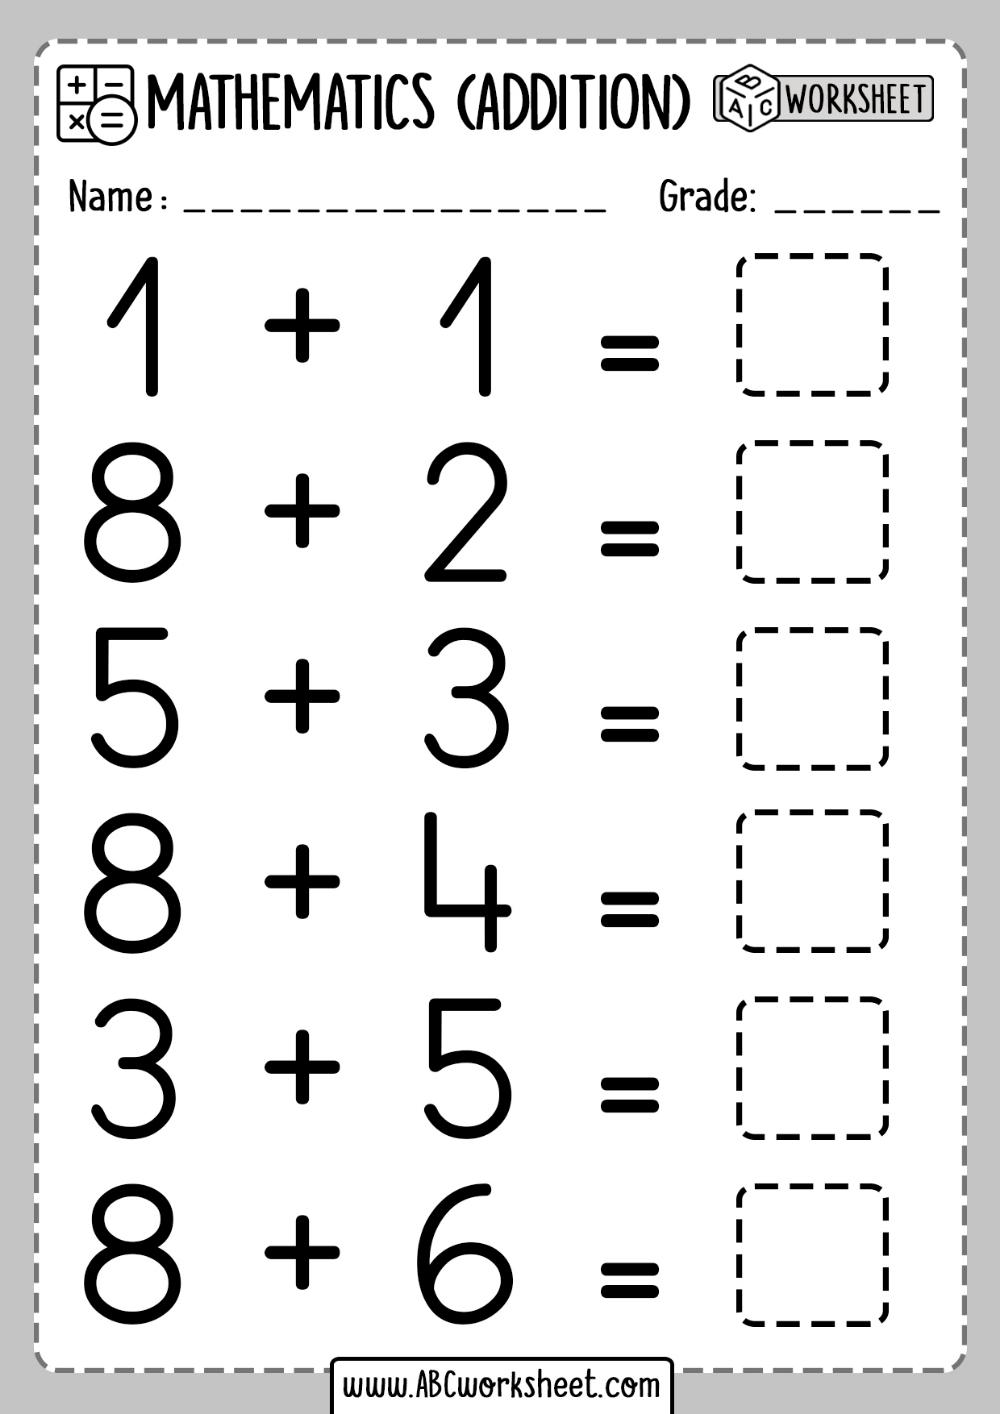 hight resolution of 1st Grade Math Worksheet Addition - ABC Worksheet en 2020